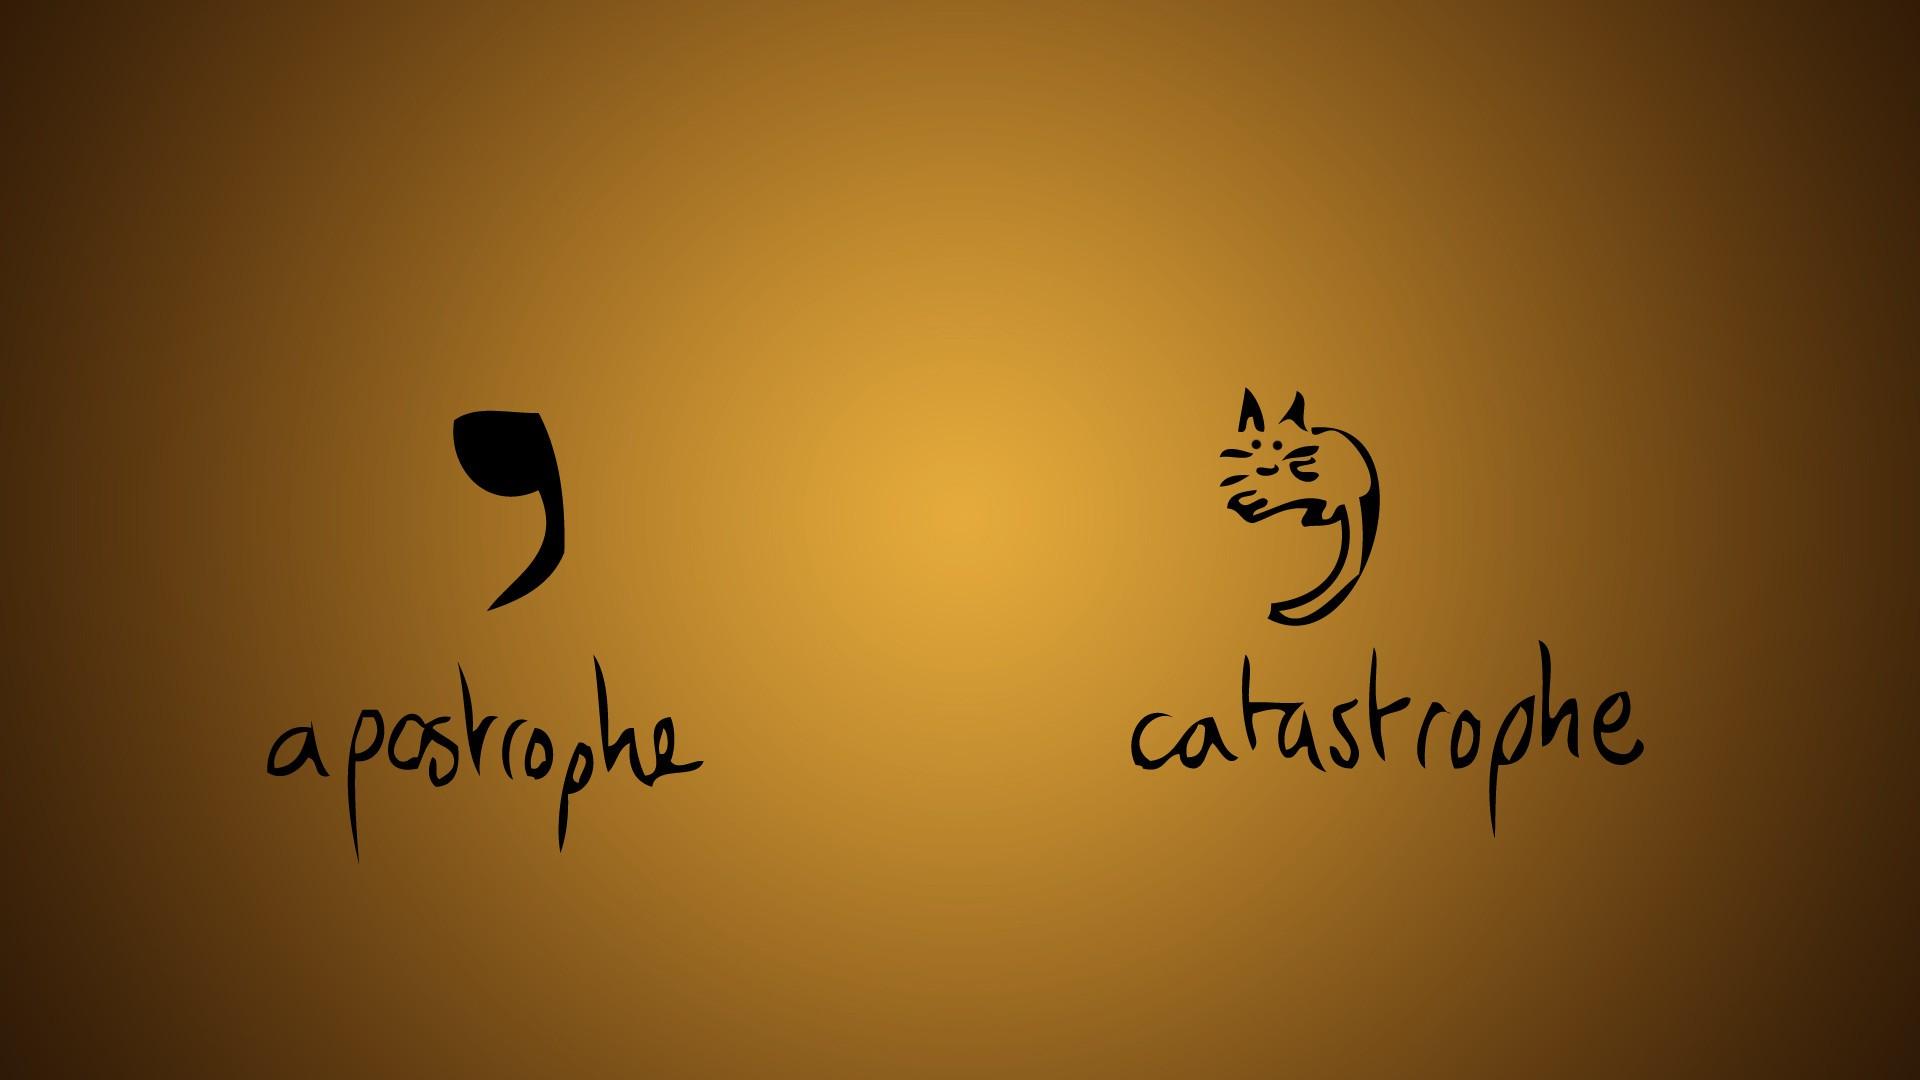 High Quality Photos Catastrophe Artwork Backgrounds Humor 1920x1080